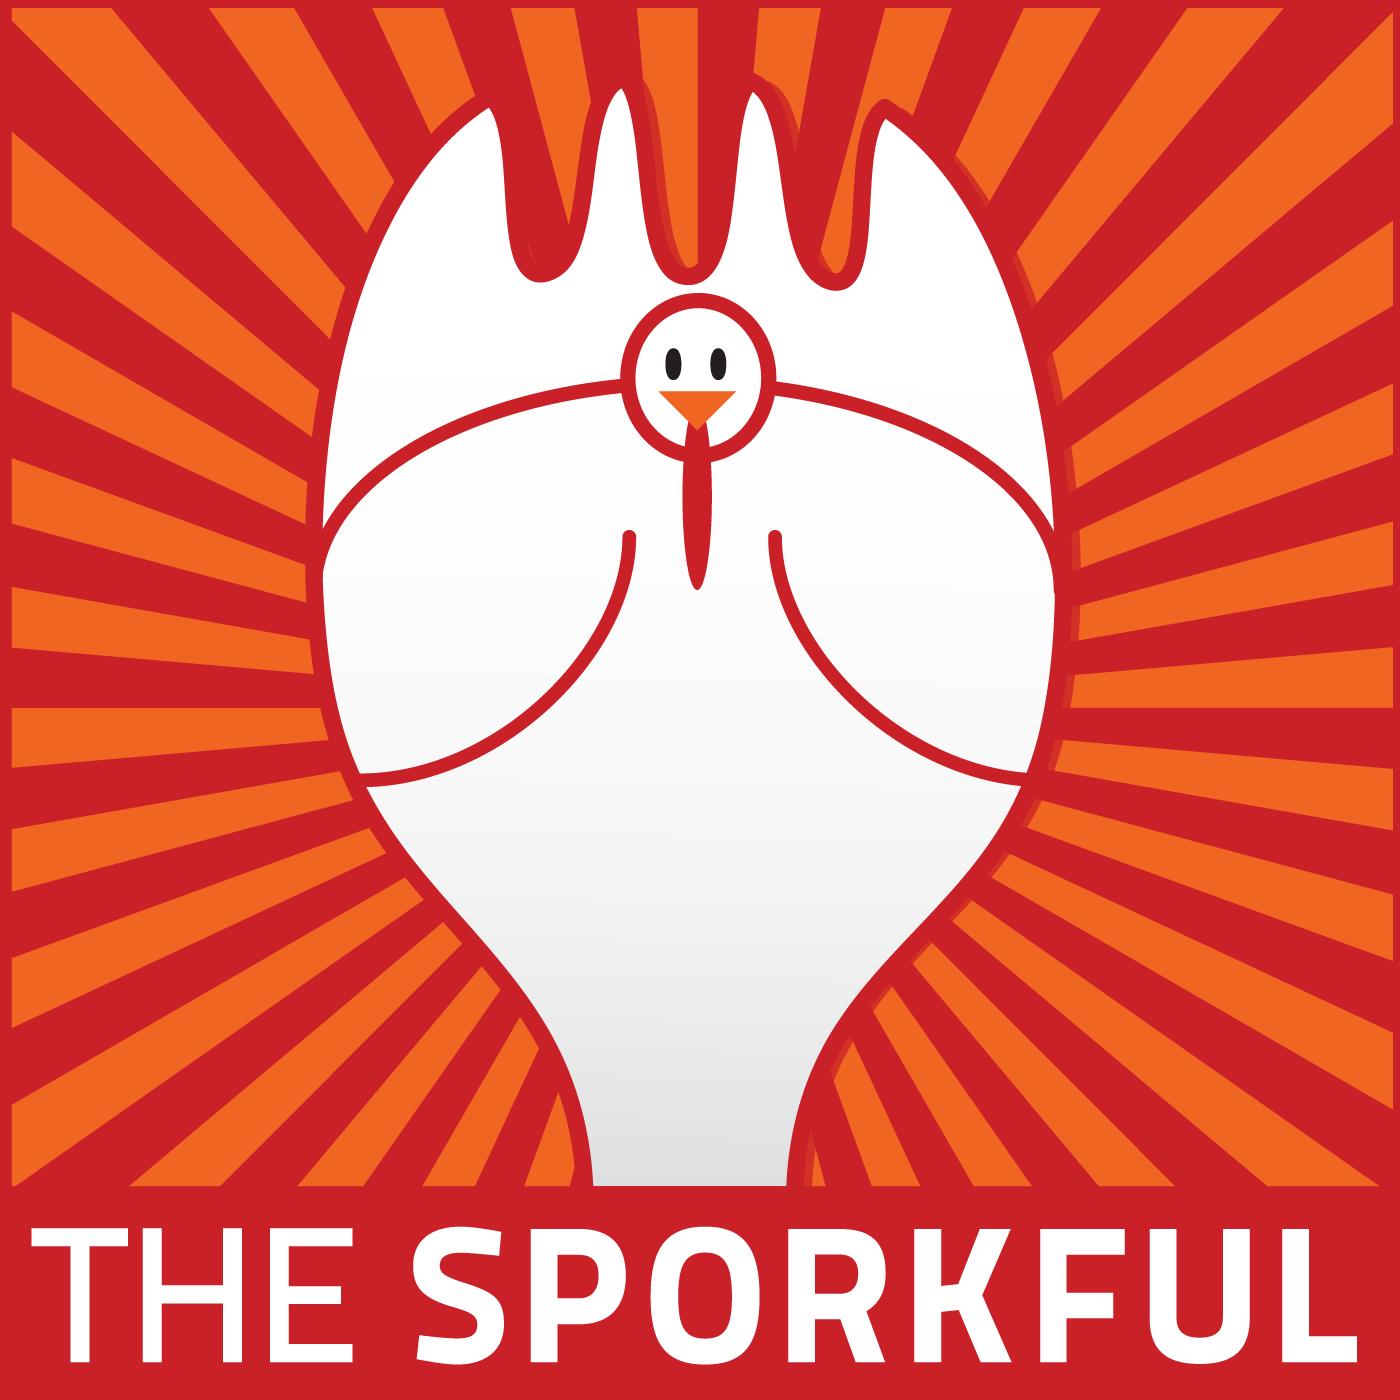 Sporkful_turkey_thanksgiving_logo_1400x1400-2_small